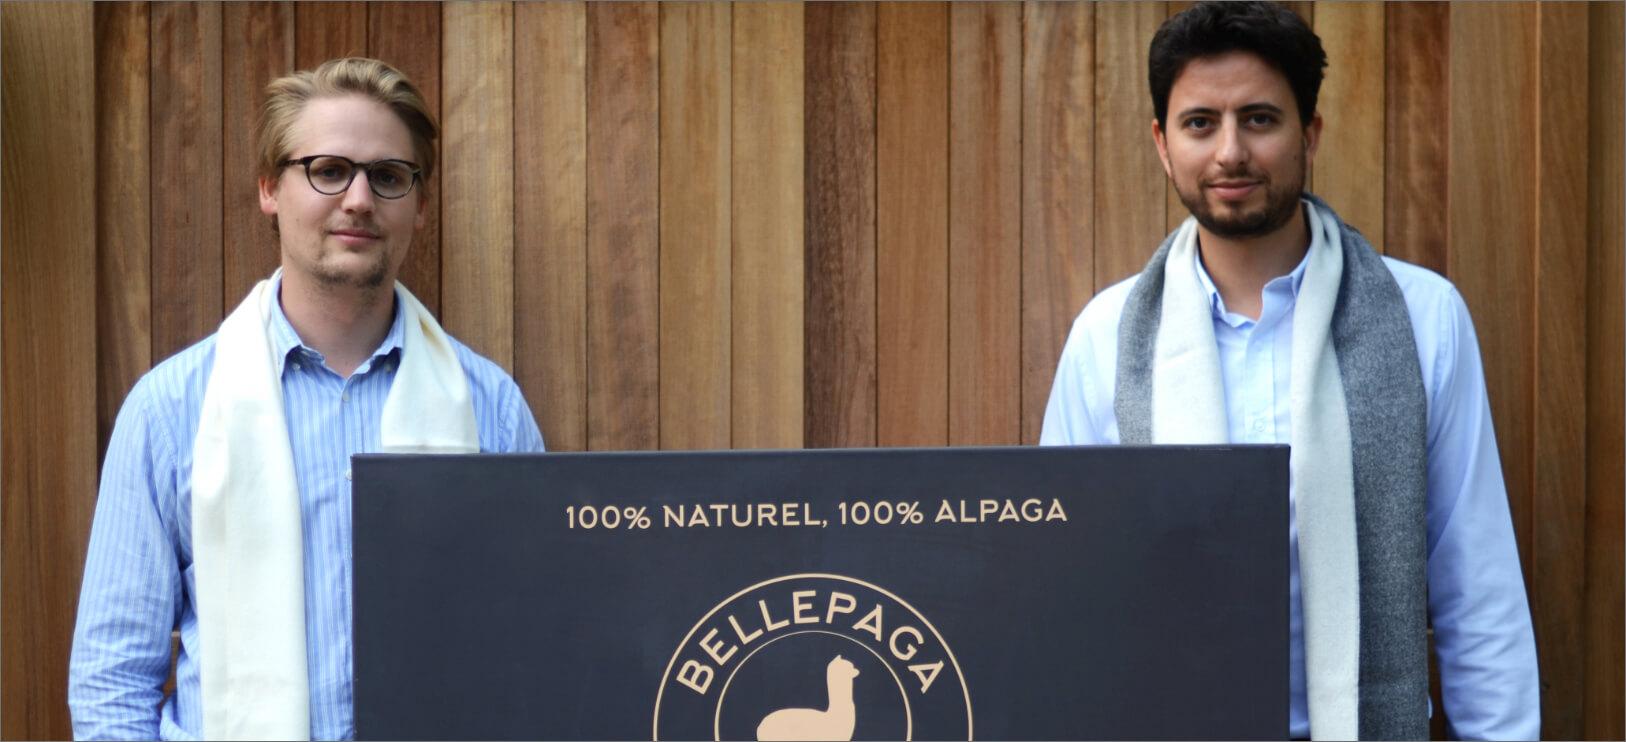 Fondateurs de BellePaga